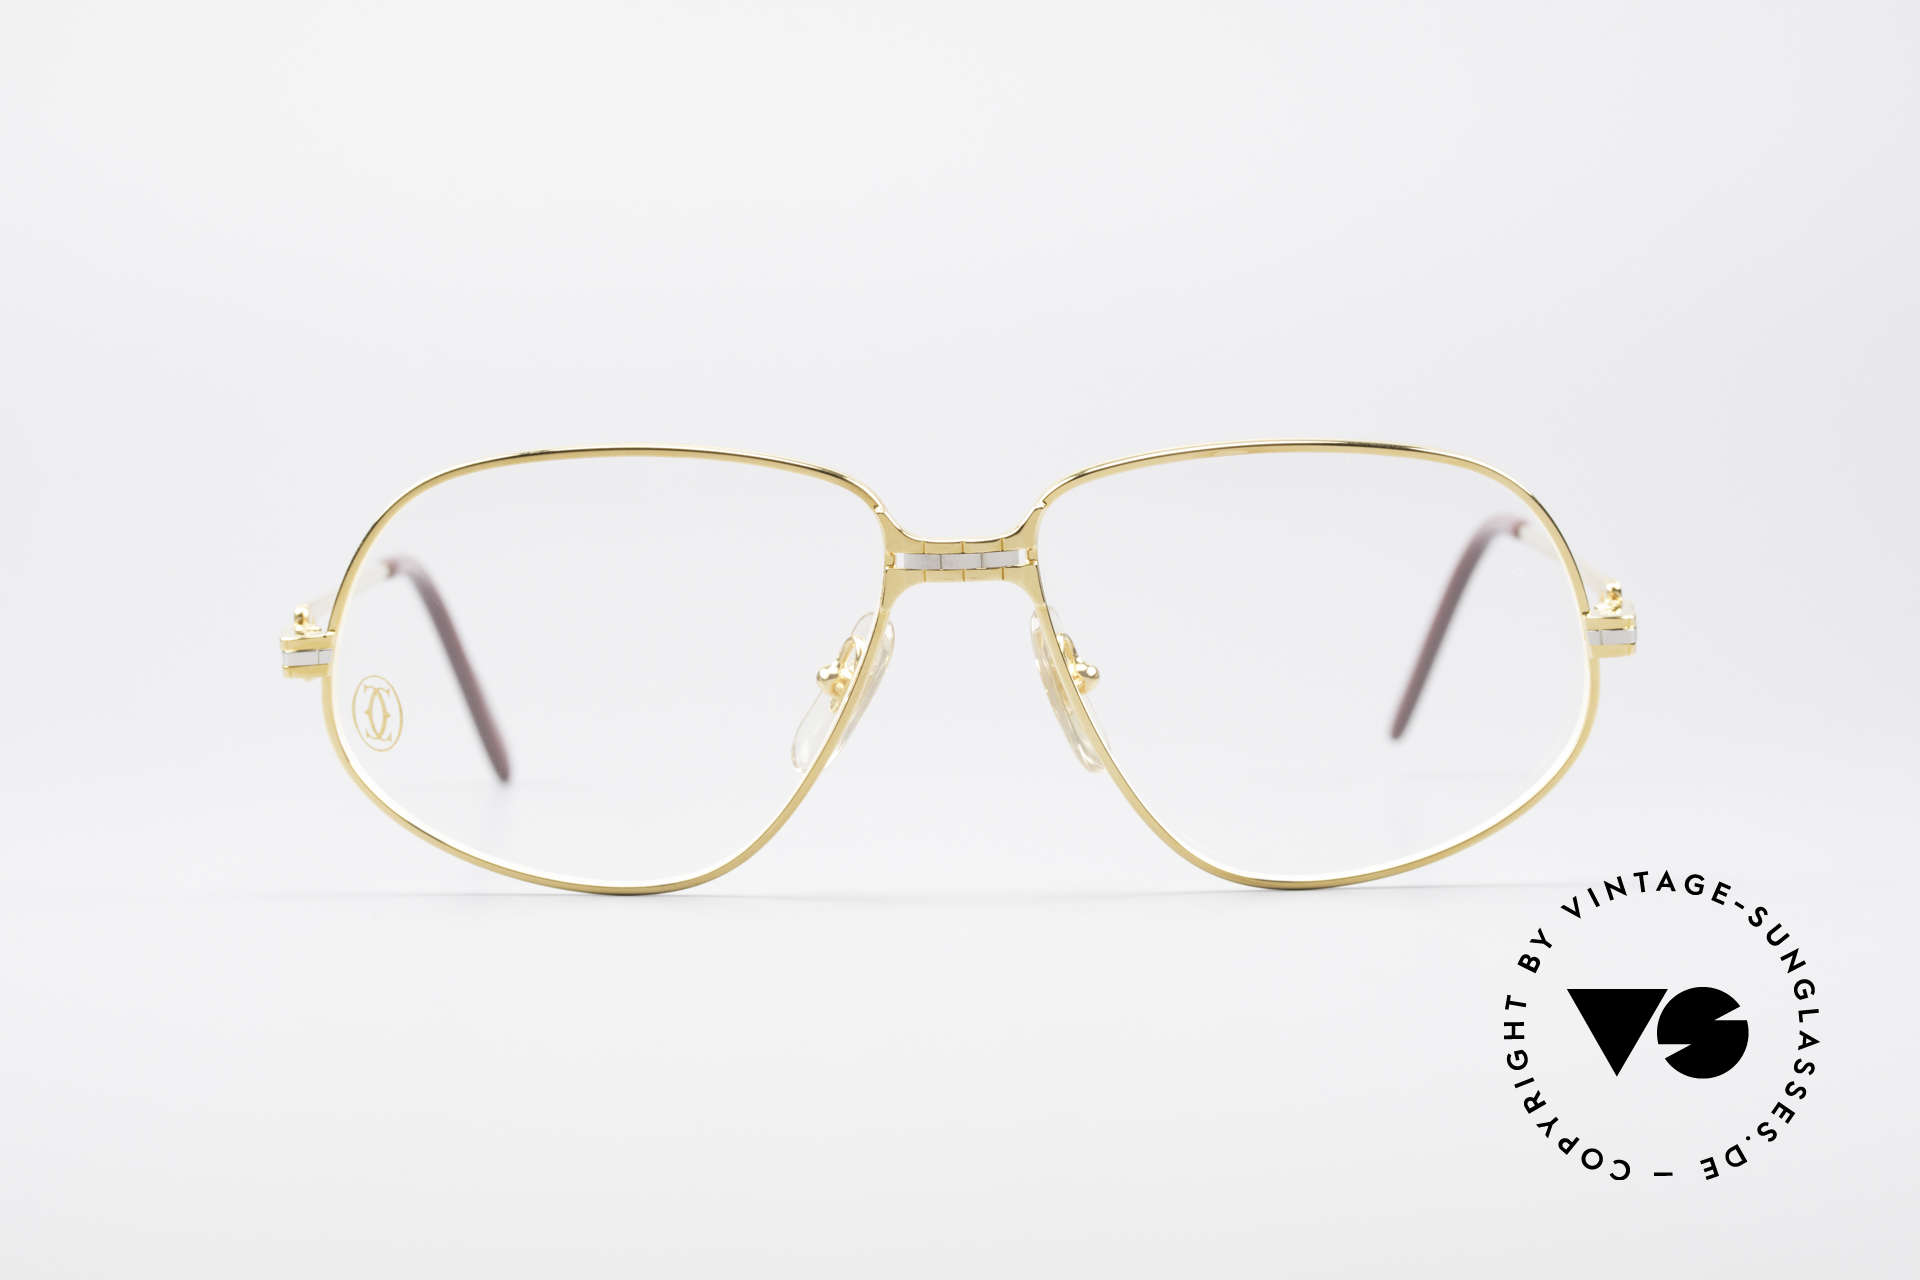 Cartier Panthere G.M. - M Luxury Eyeglasses, G.M. stands for 'grande modèle' for monsieur / gentleman, Made for Men